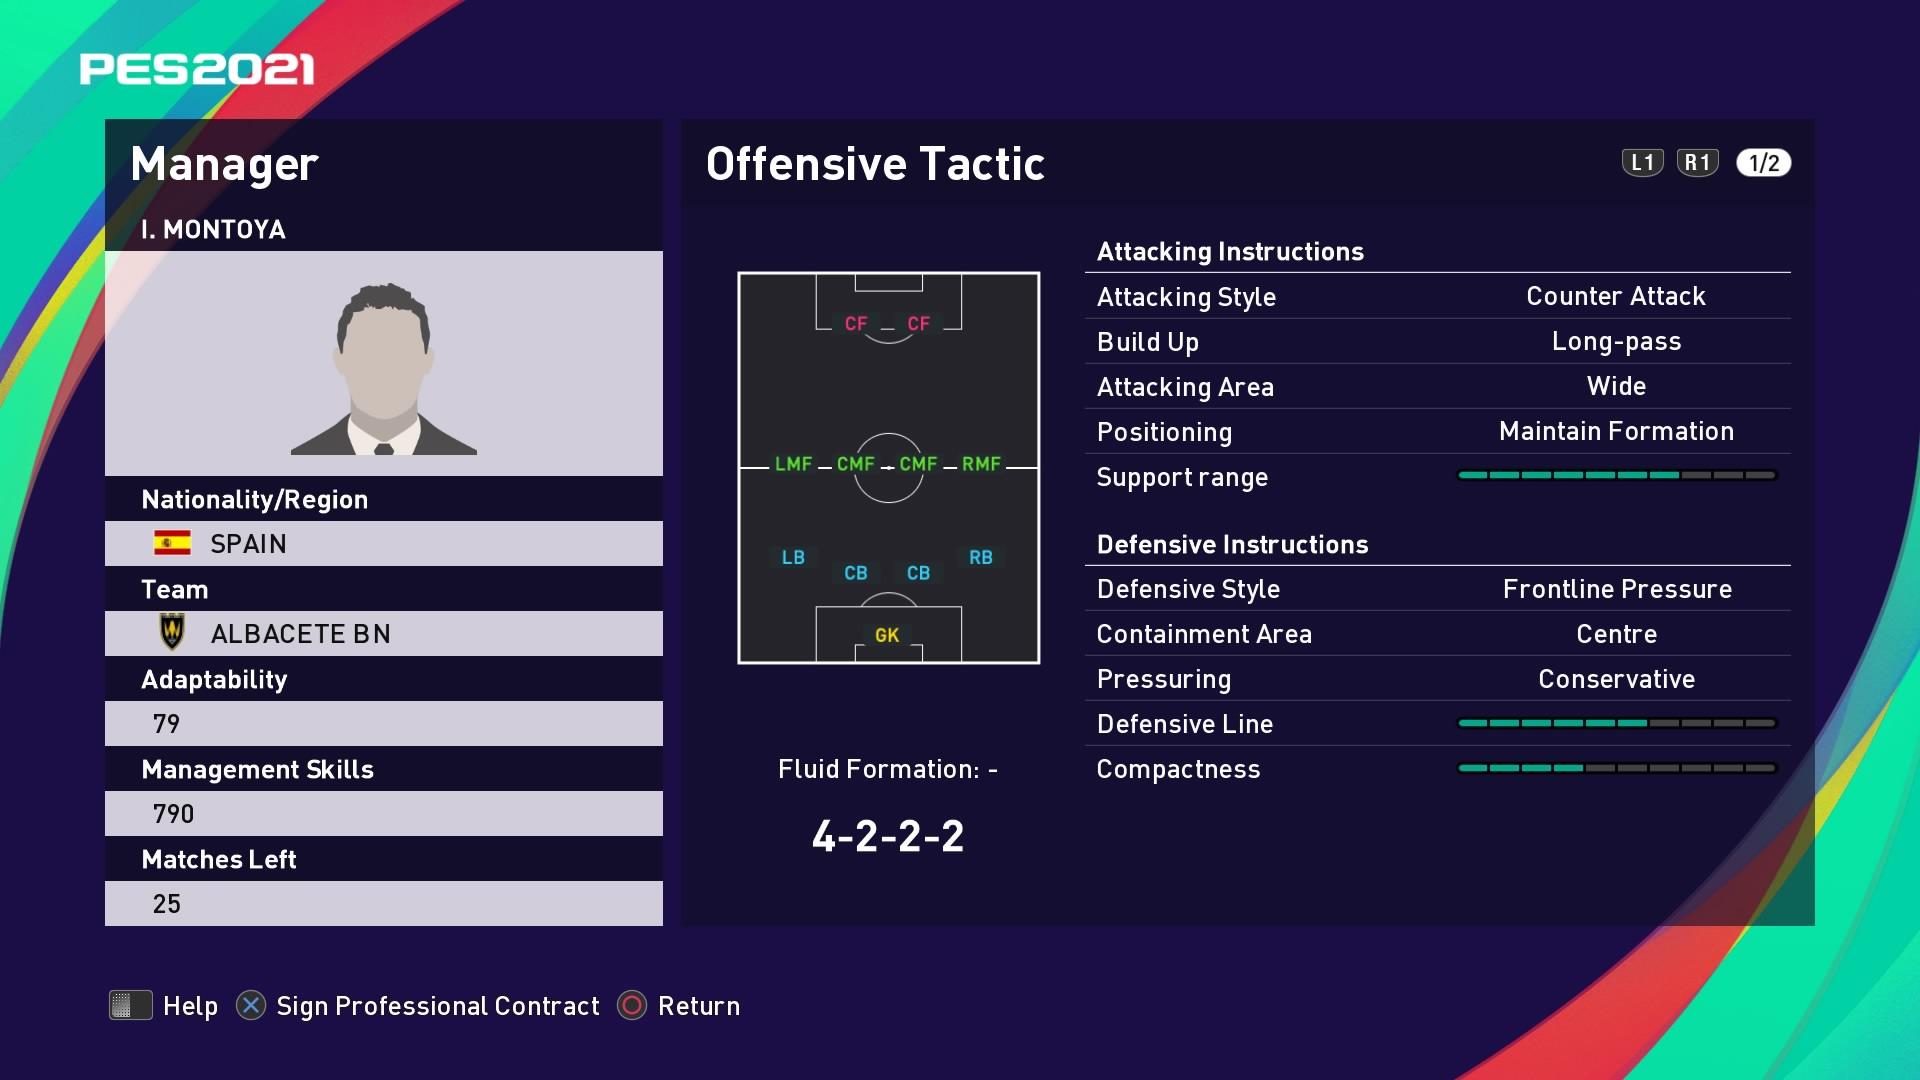 I. Montoya (Luis Miguel Ramis) Offensive Tactic in PES 2021 myClub